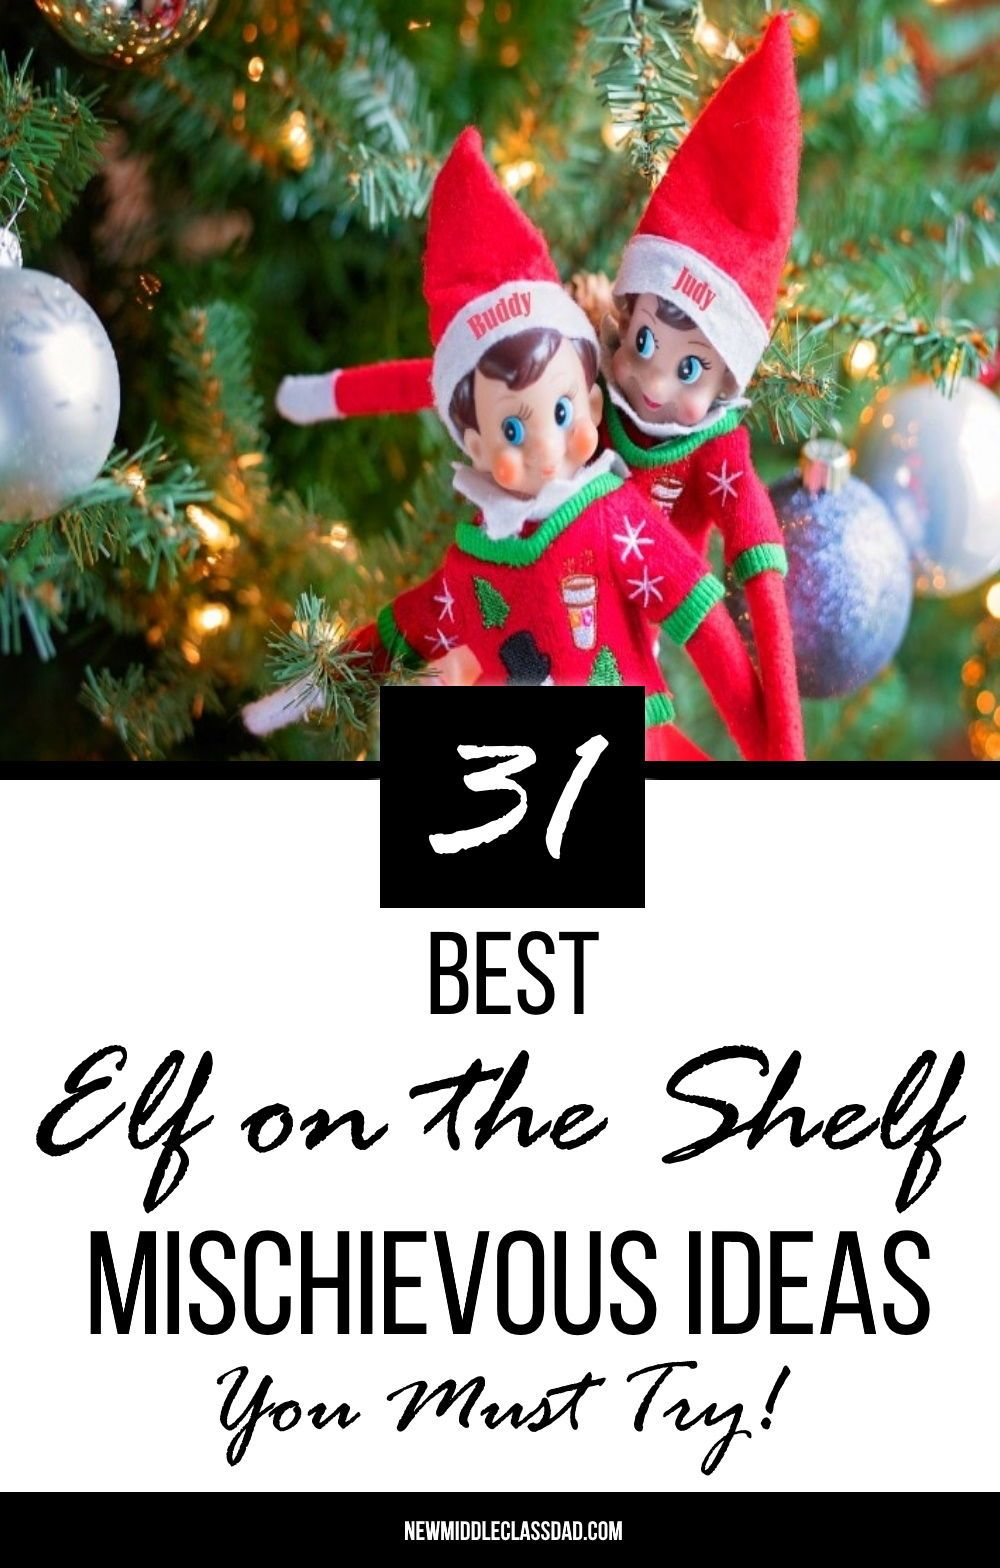 31 Best Elf on the Shelf Mischievous Ideas You Must Try!